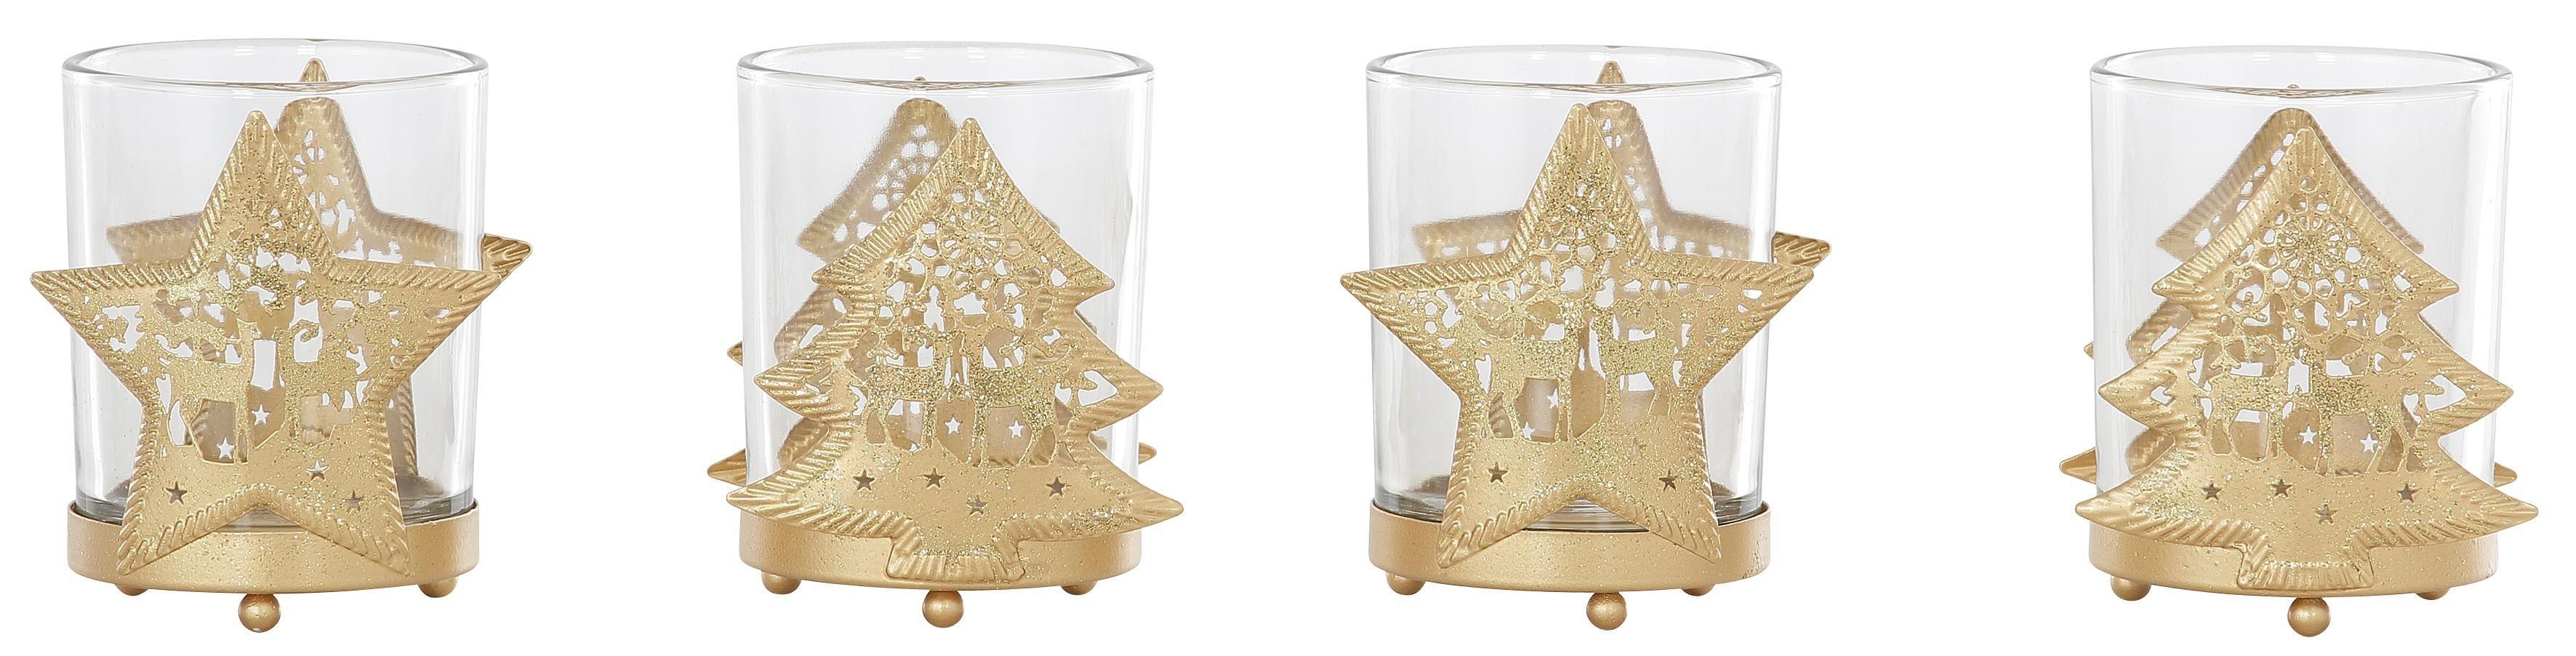 Inge-Glas LED Teelichthalter, 4er-Set